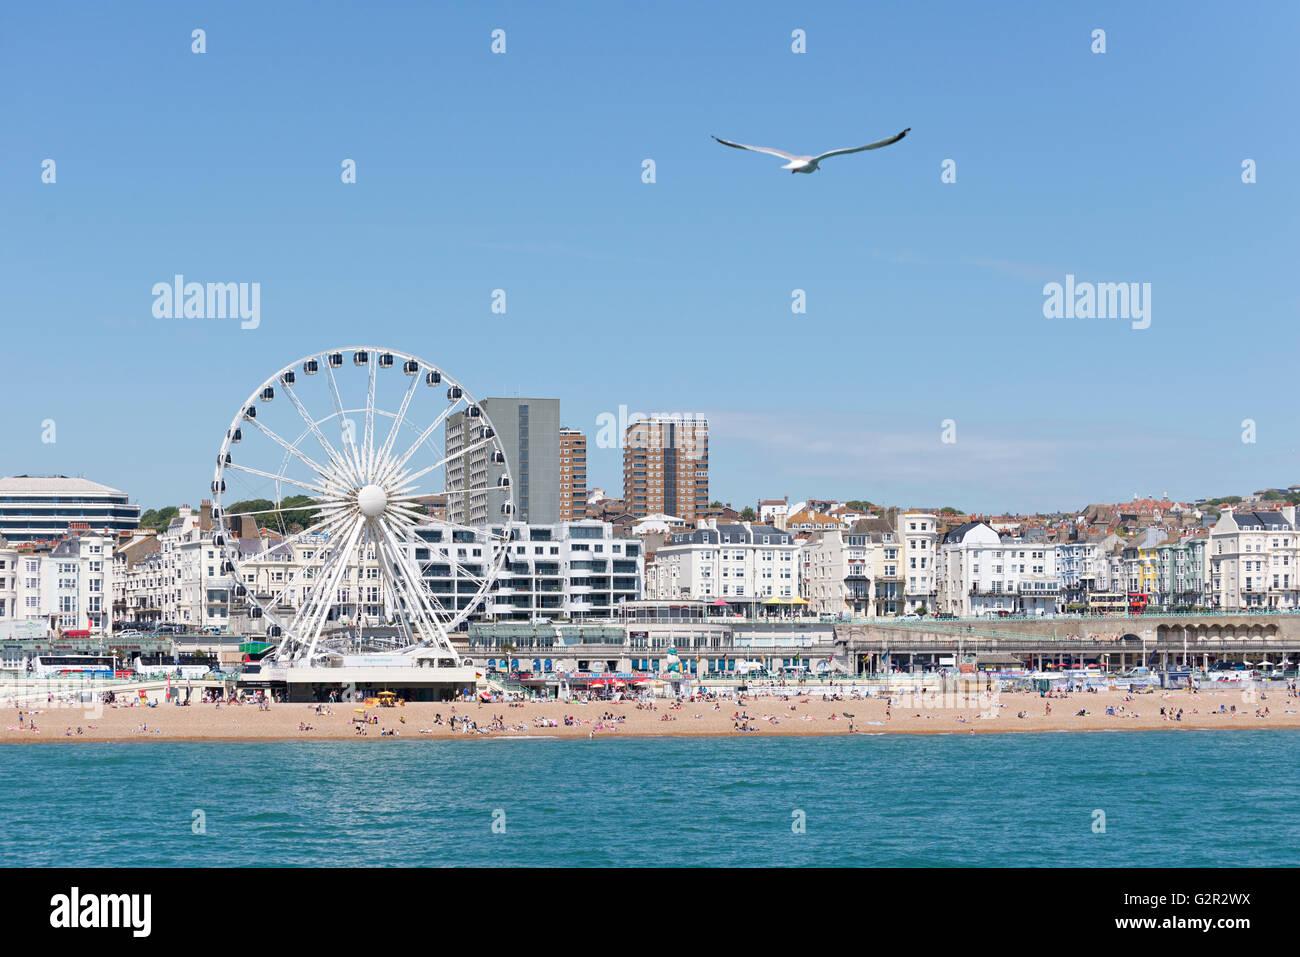 Brighton beach view - Stock Image